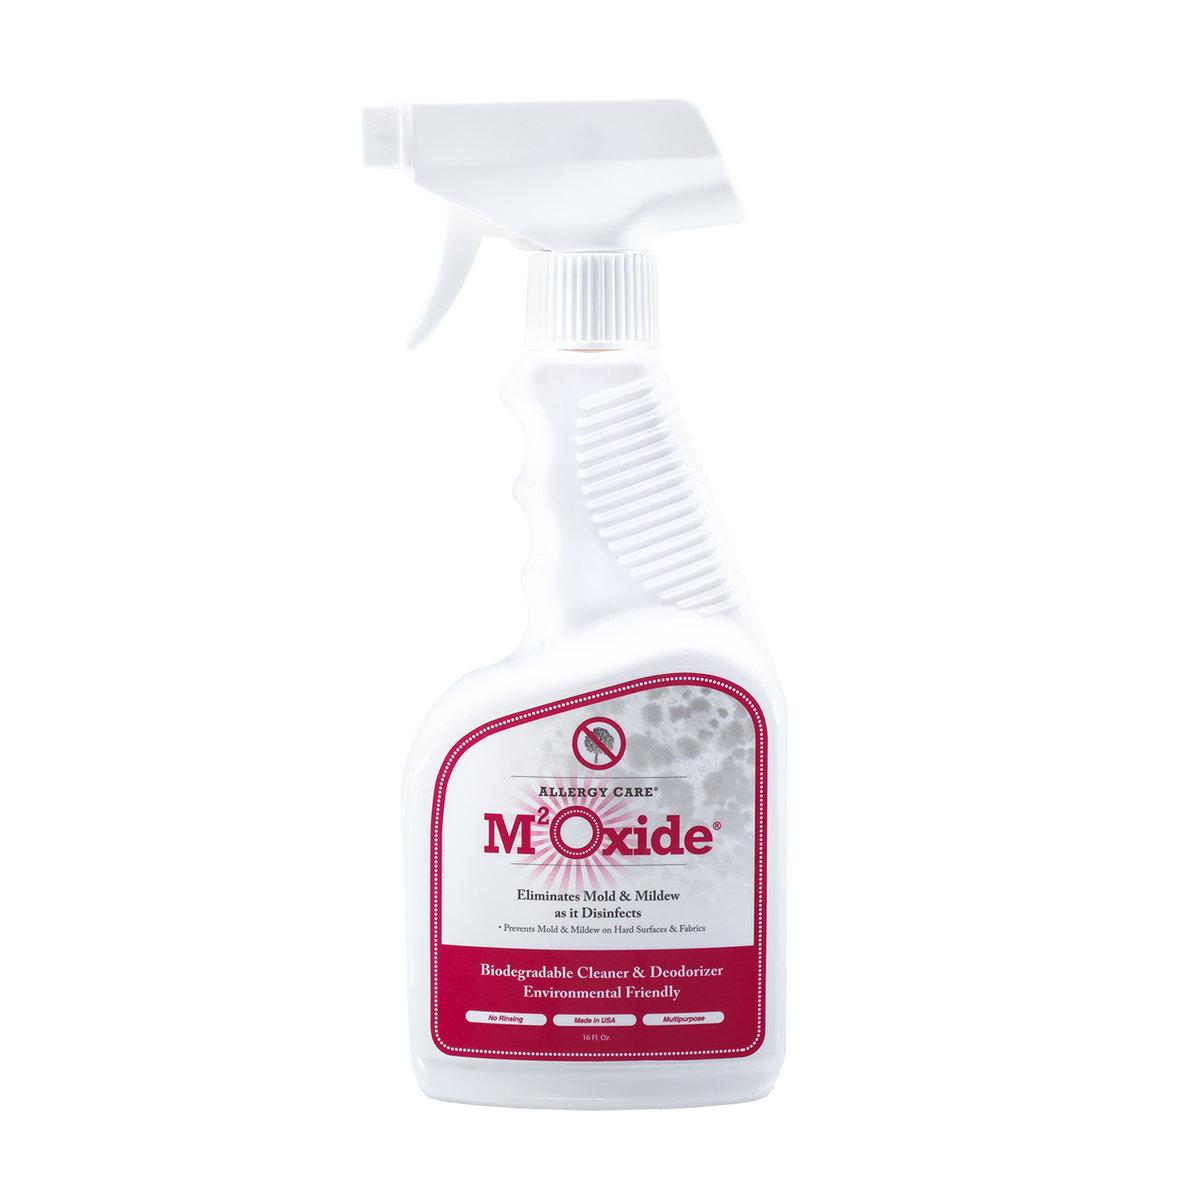 M²Oxide Broad Spectrum Disinfectant-Cleaner -16oz